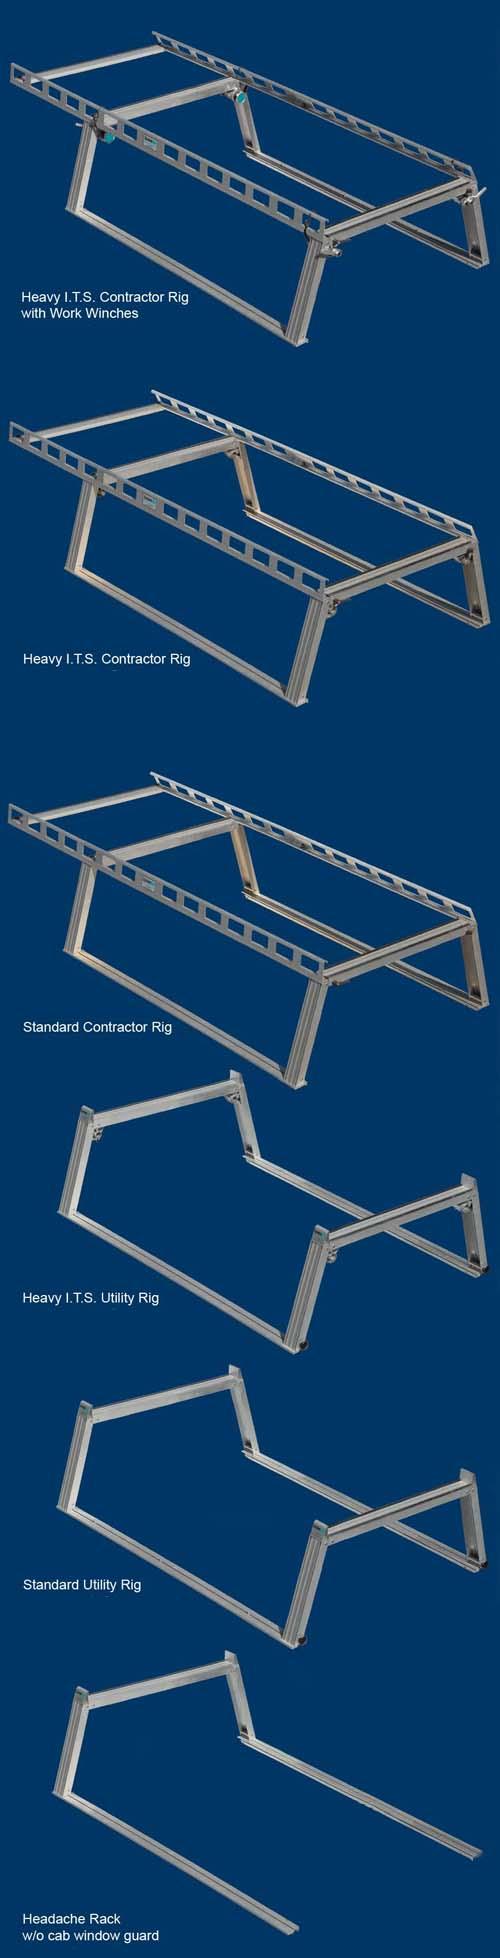 System One Ladder Racks - Davis Trailer World   Sales